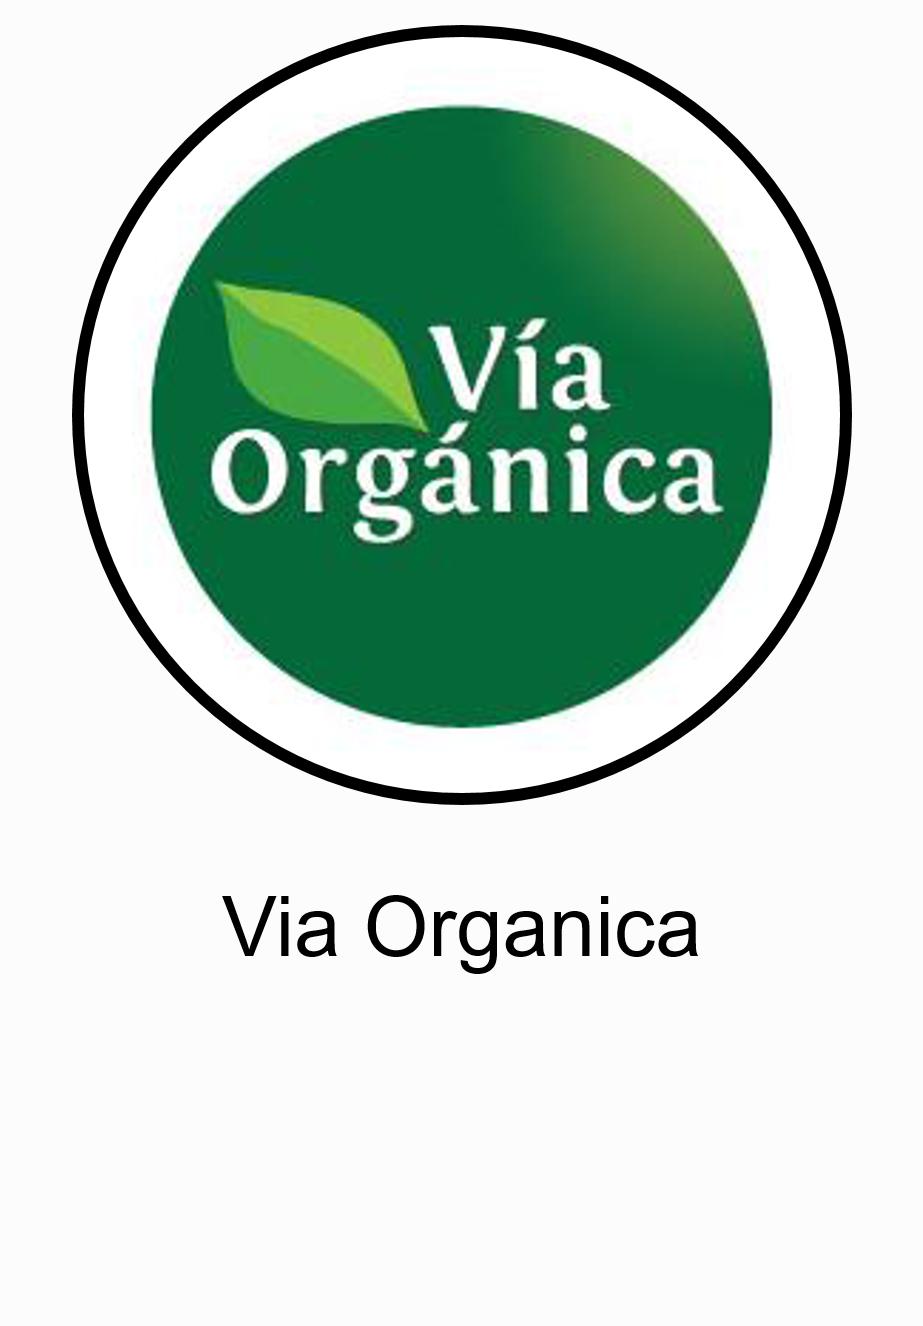 Via Organica FINAL.png